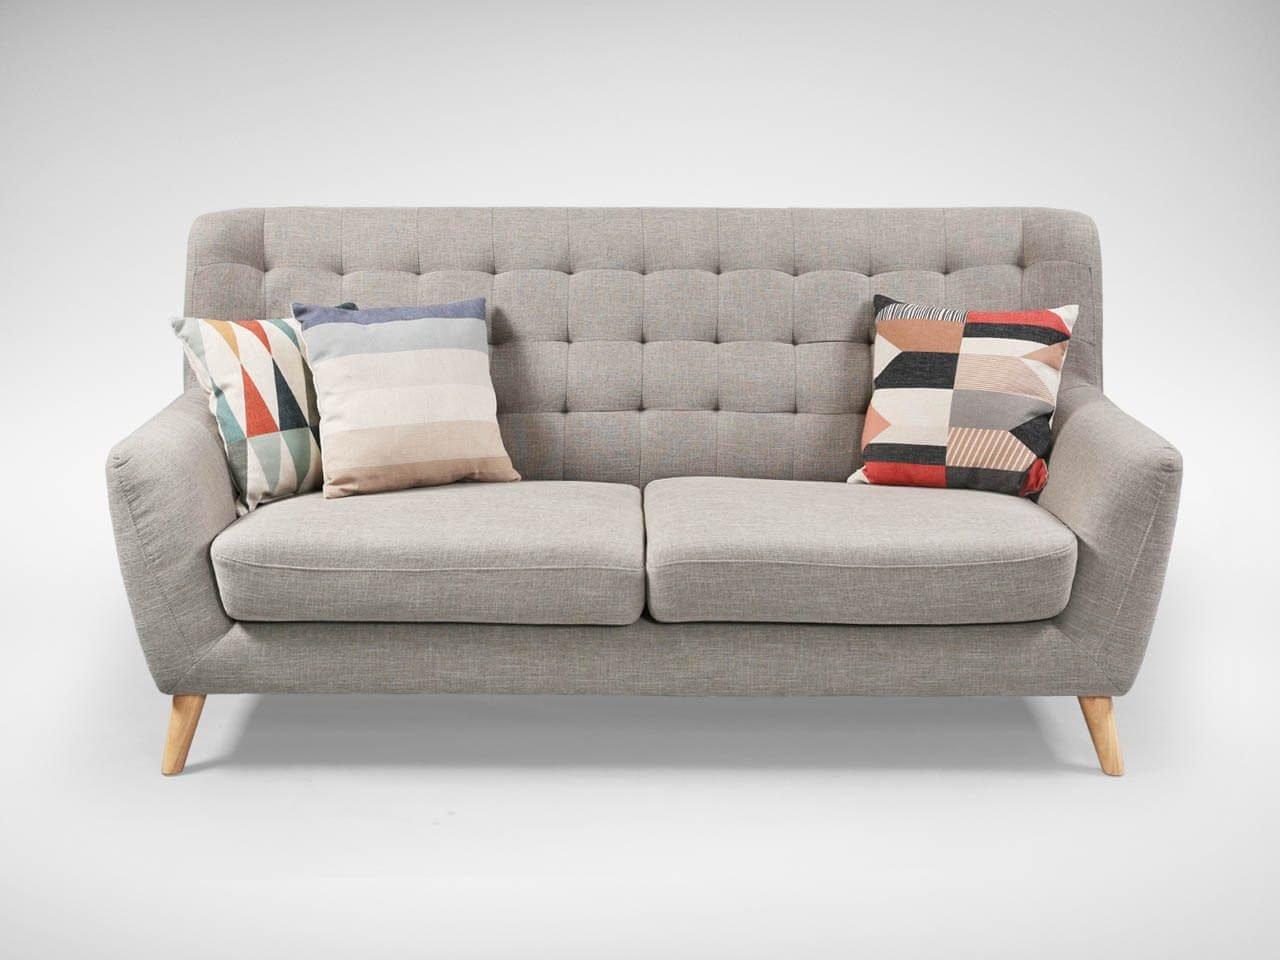 Modern 3-Seater Sofa for Living Room - Comfort Furniture